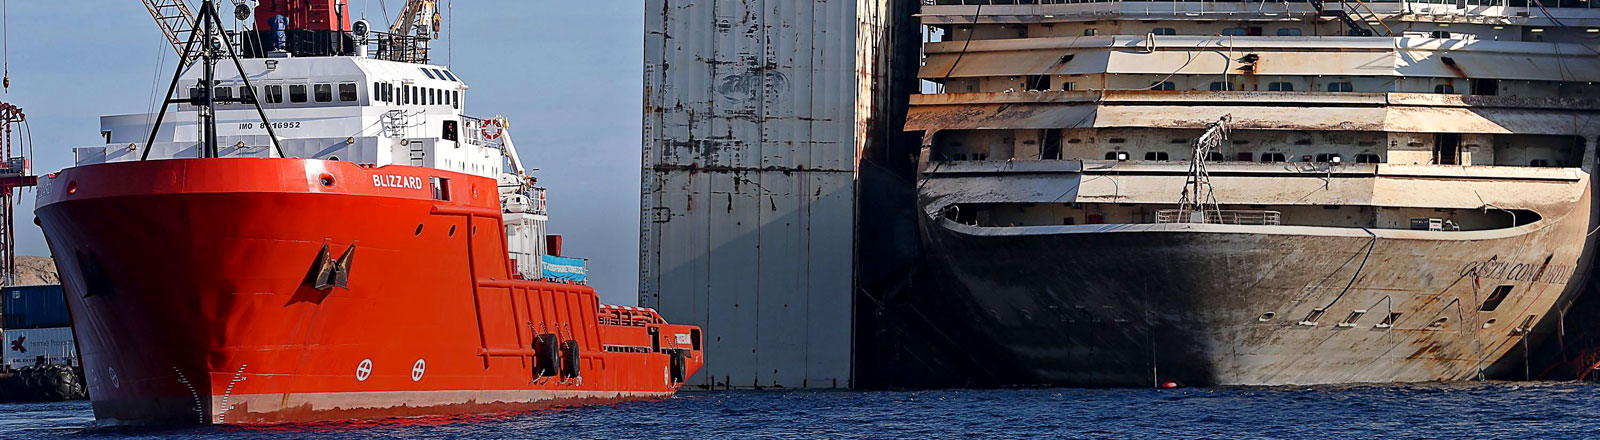 Costa Concordia wird abtransportiert.